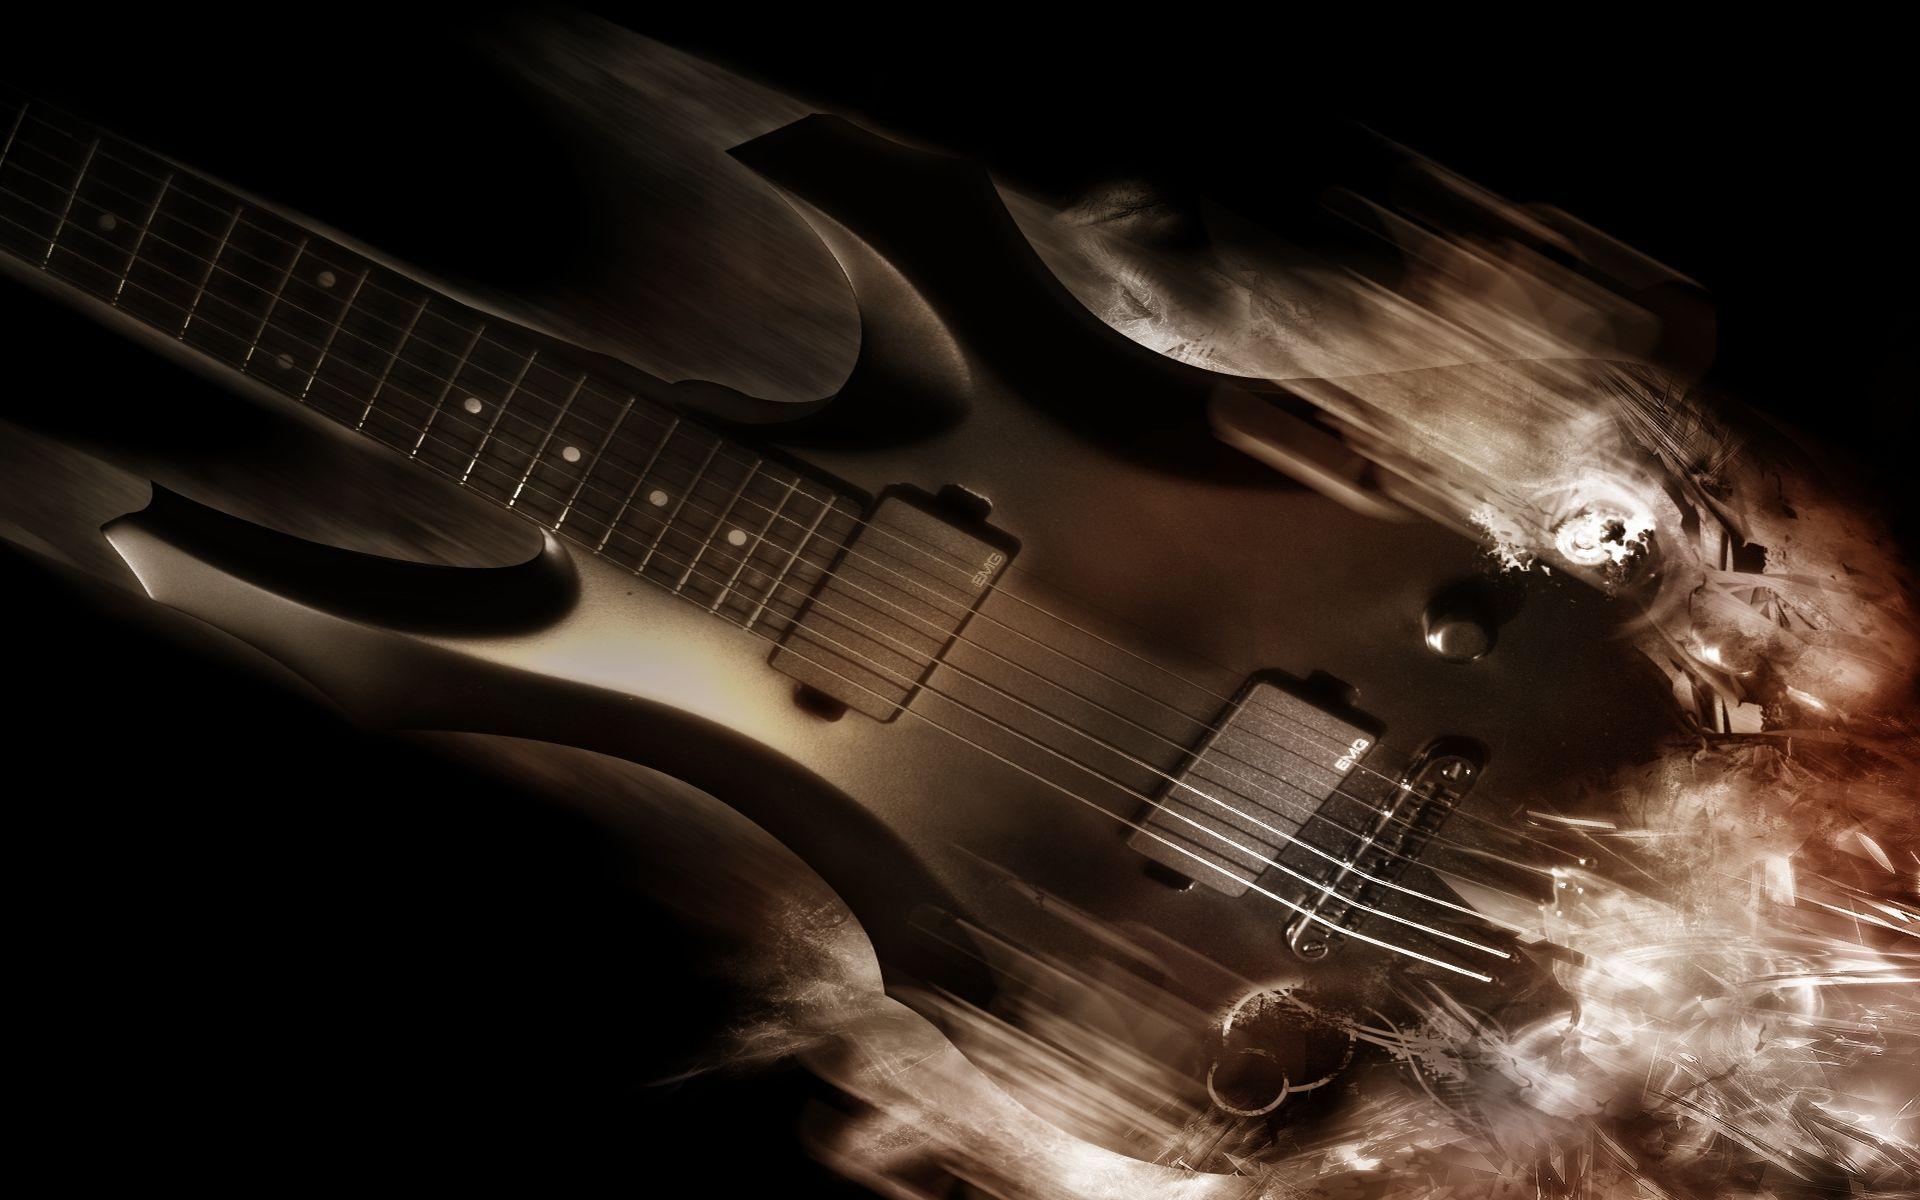 Electric Guitar, PC Wallpaper HD